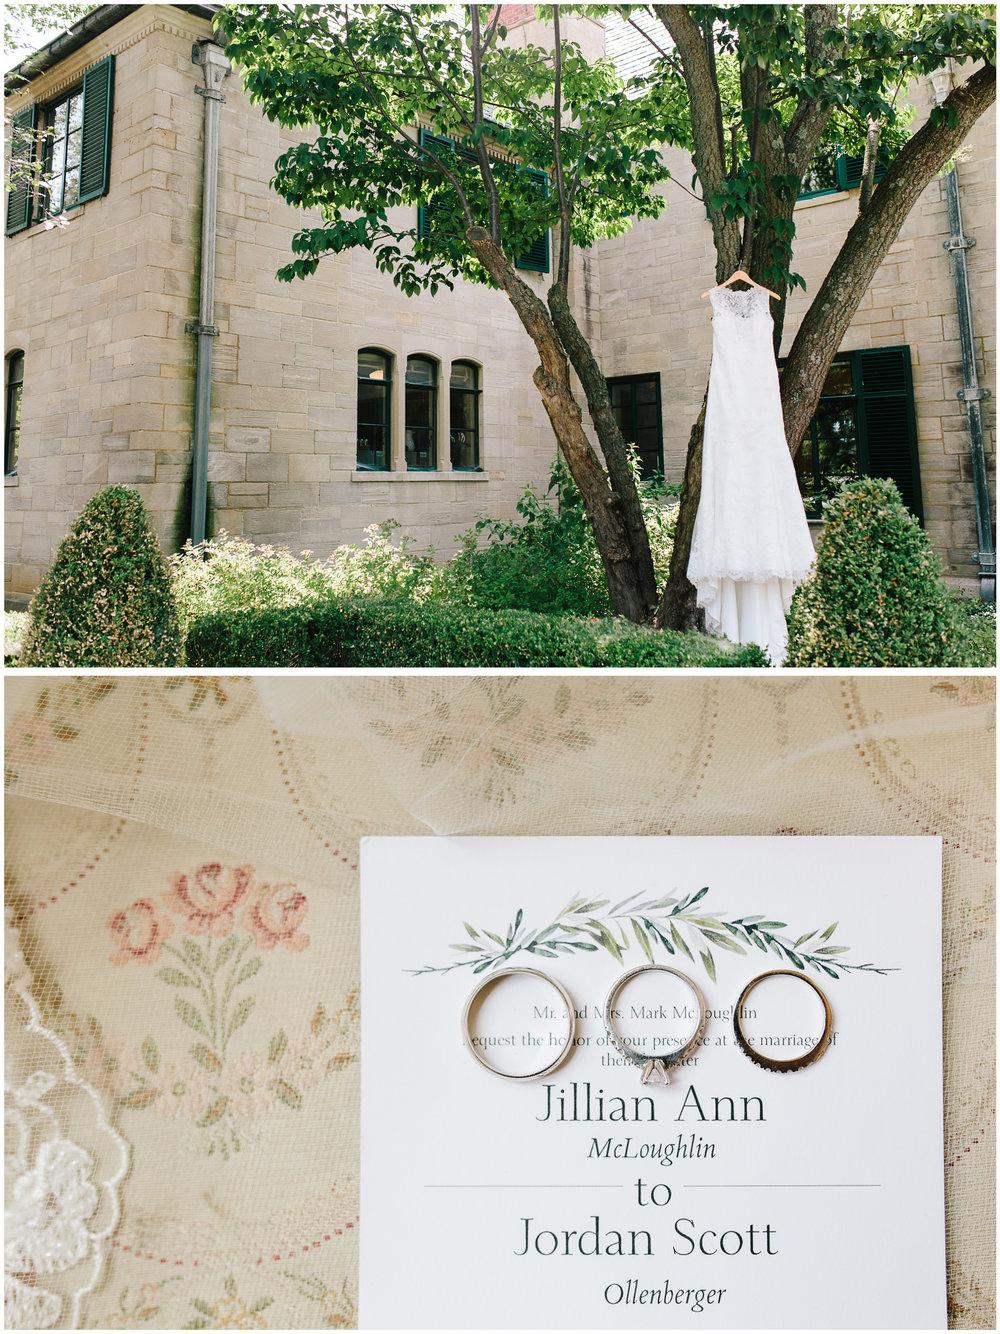 ann_arbor_michigan_wedding_2.jpg